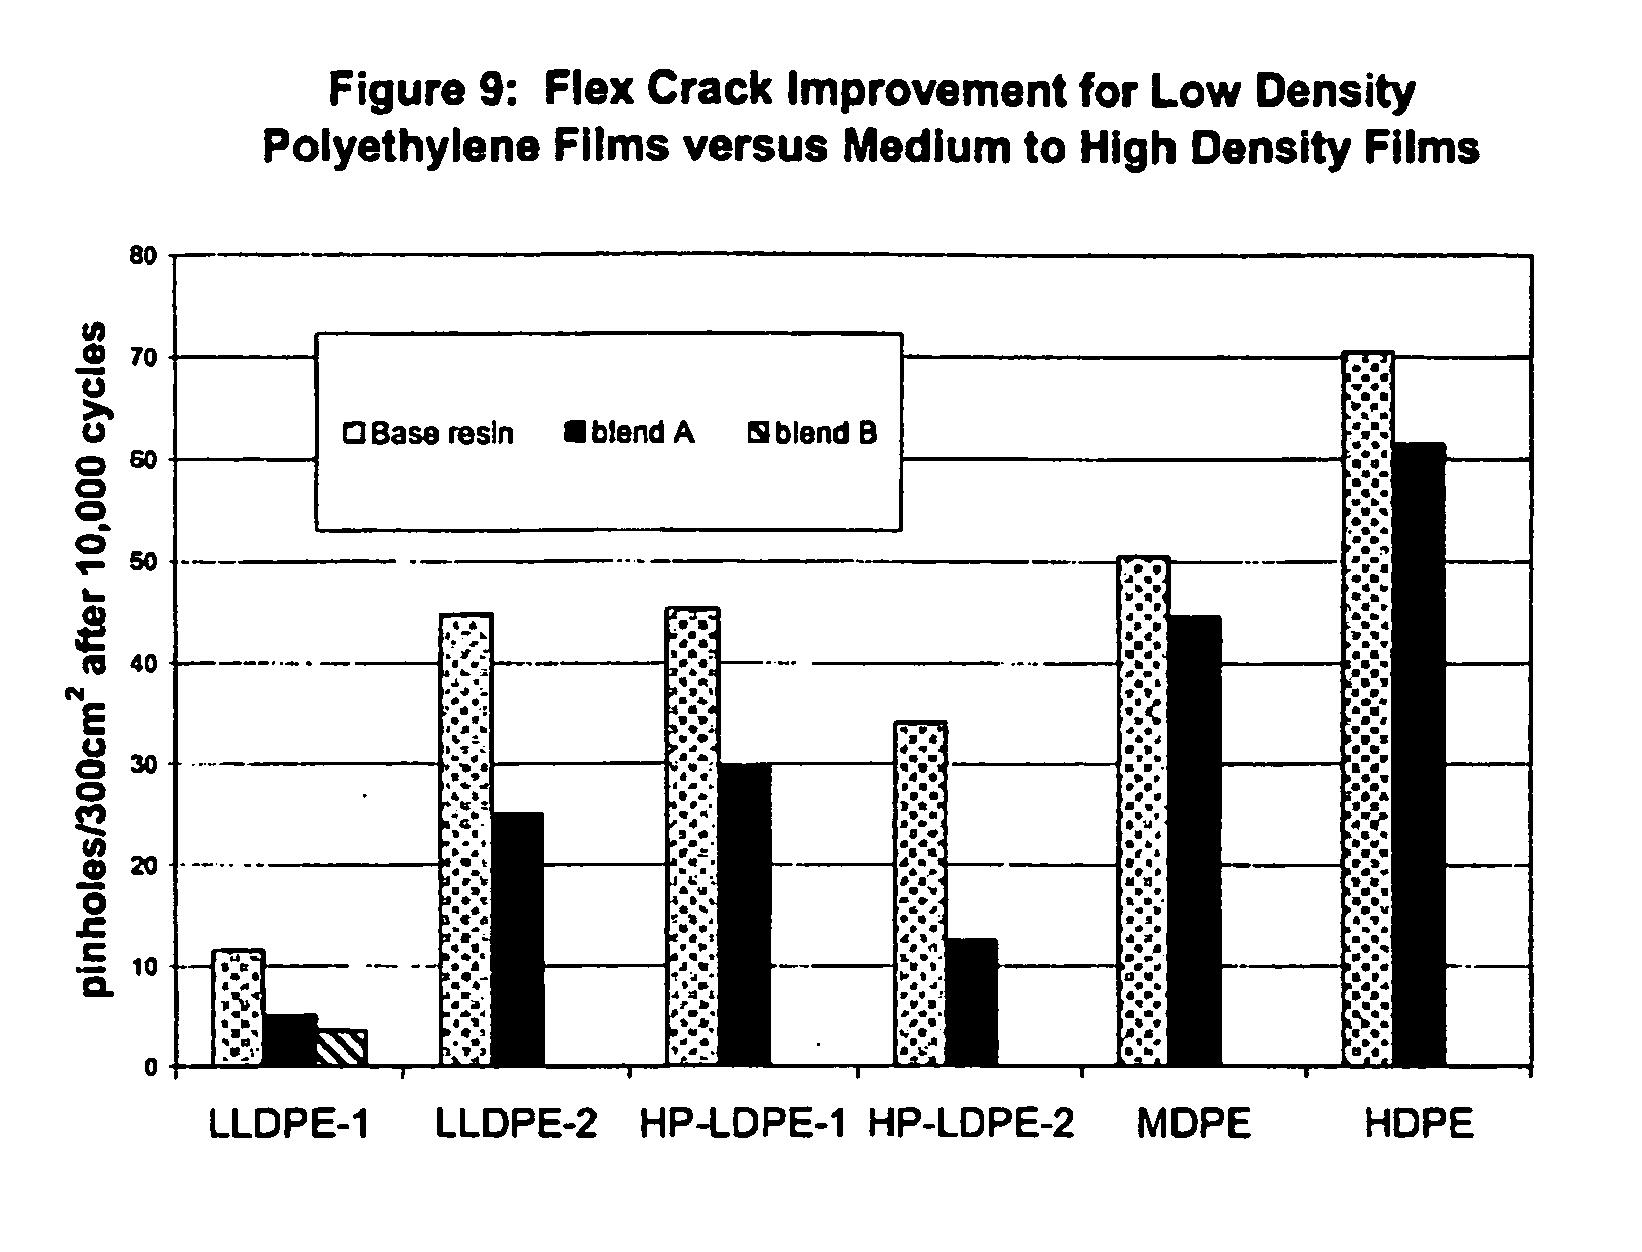 FLEX CRACK RESISTANT LOW DENSITY POLYETHYLENE FILMS - Patent